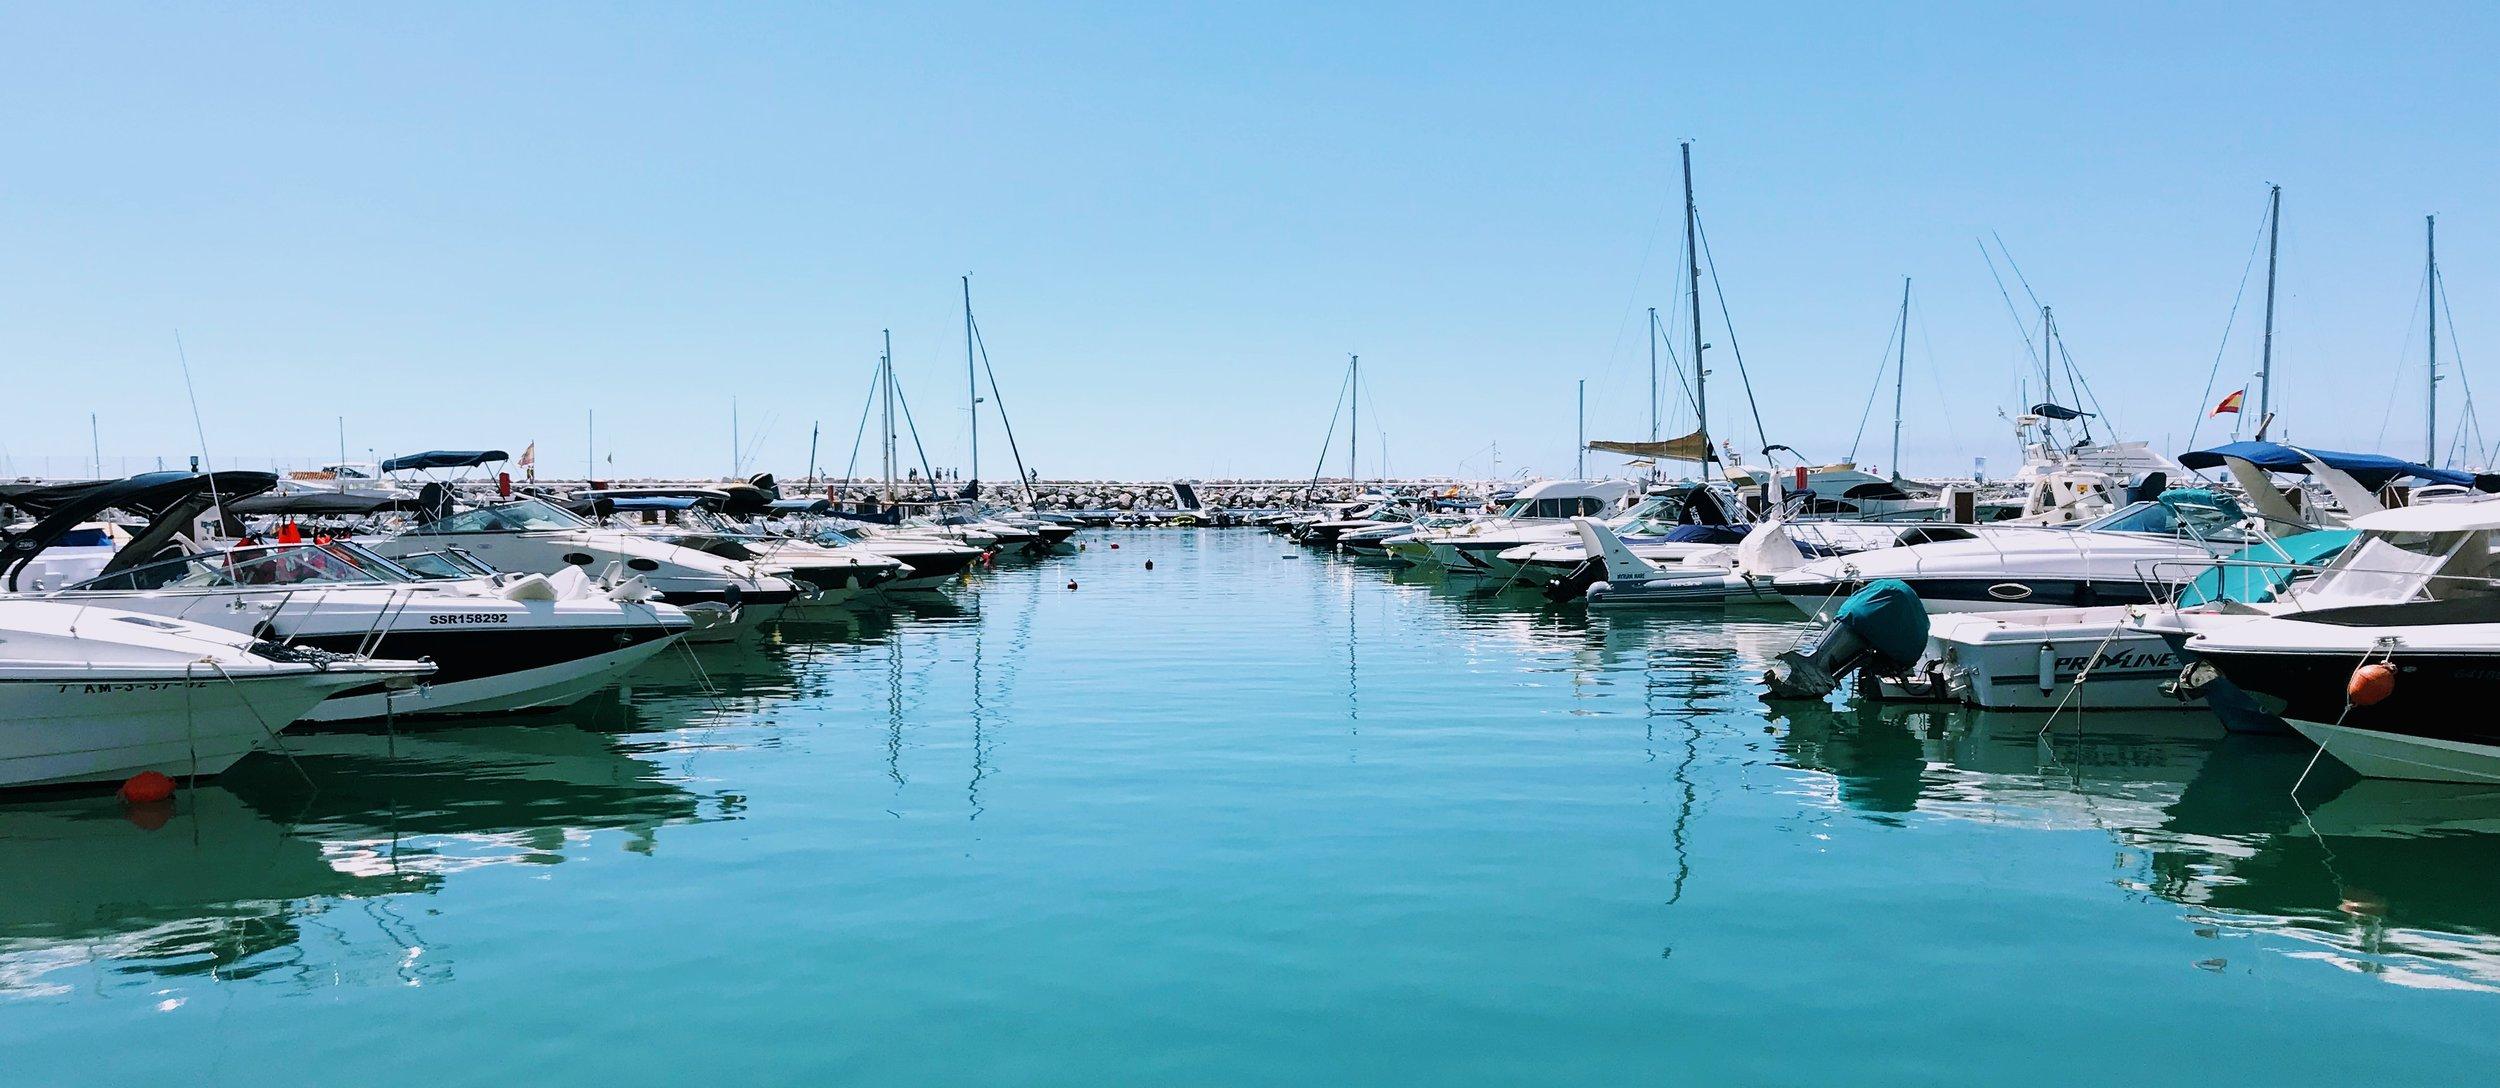 Puerto Banús Marina, Málaga, Spain